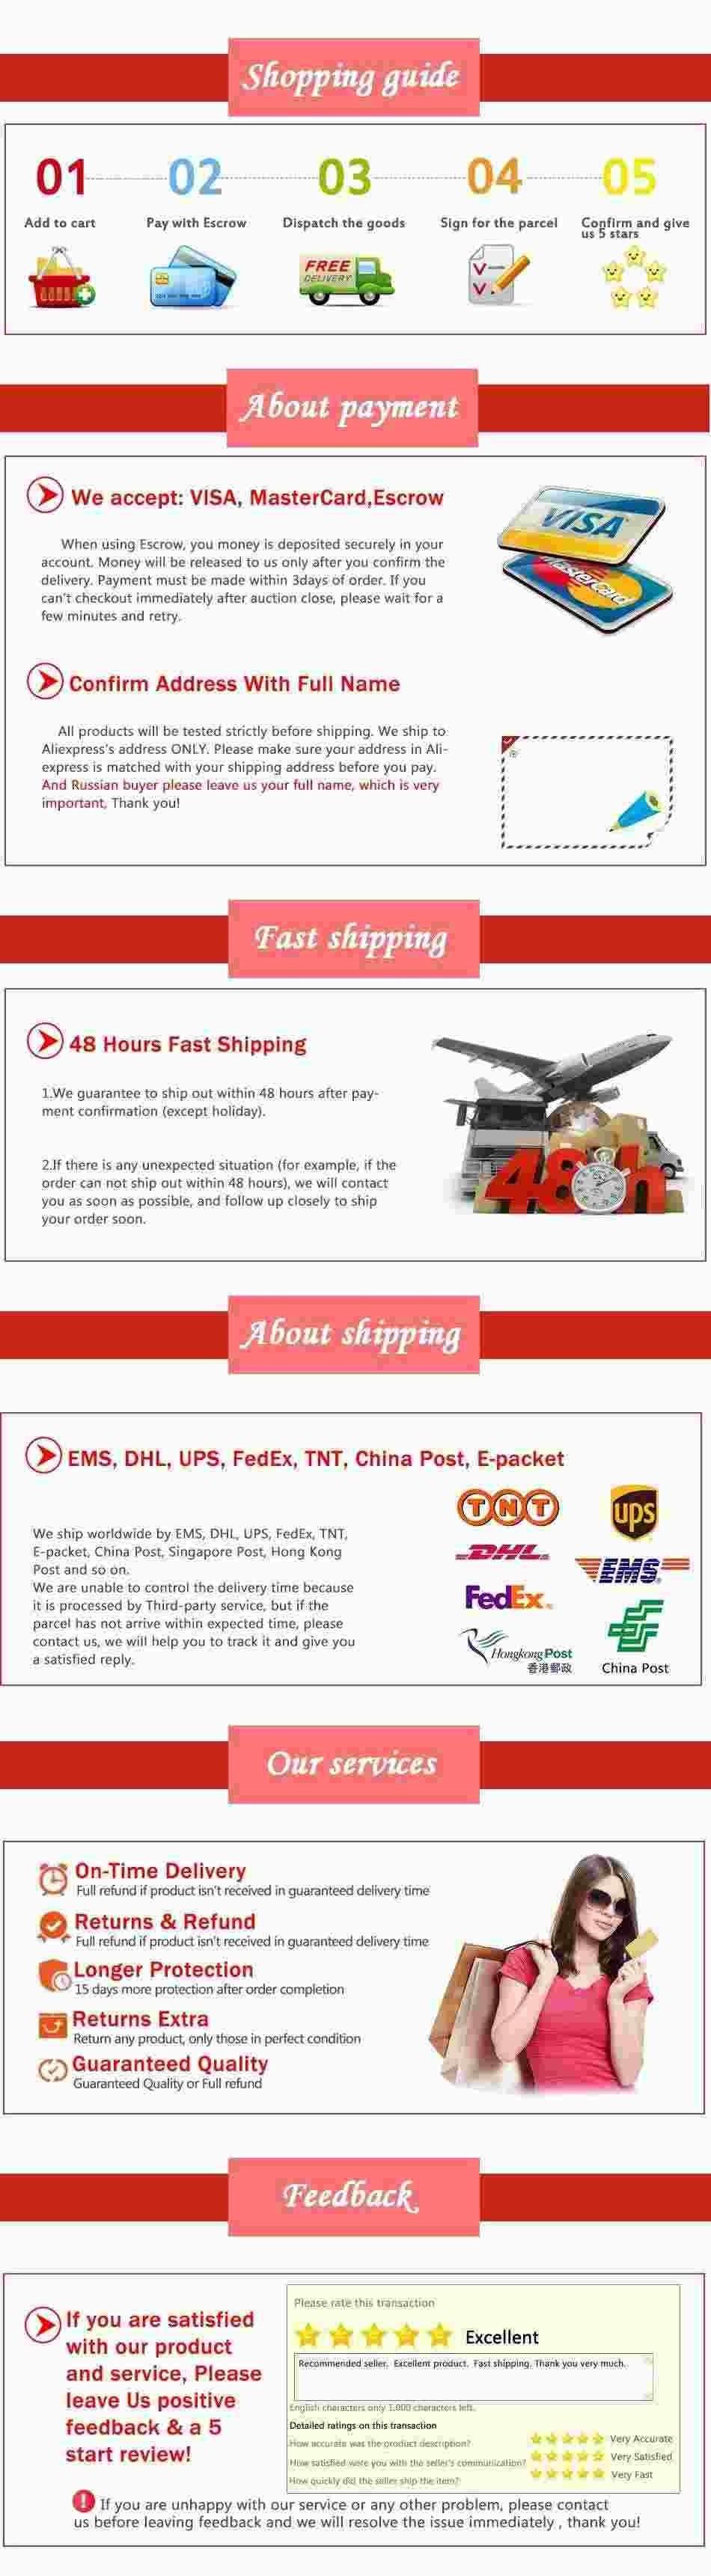 Multi-Function Pliers zhe die qian Outdoor Combination-Purpose Pliers Small Saber zhe die qian mini Tool Clamp drop shipping